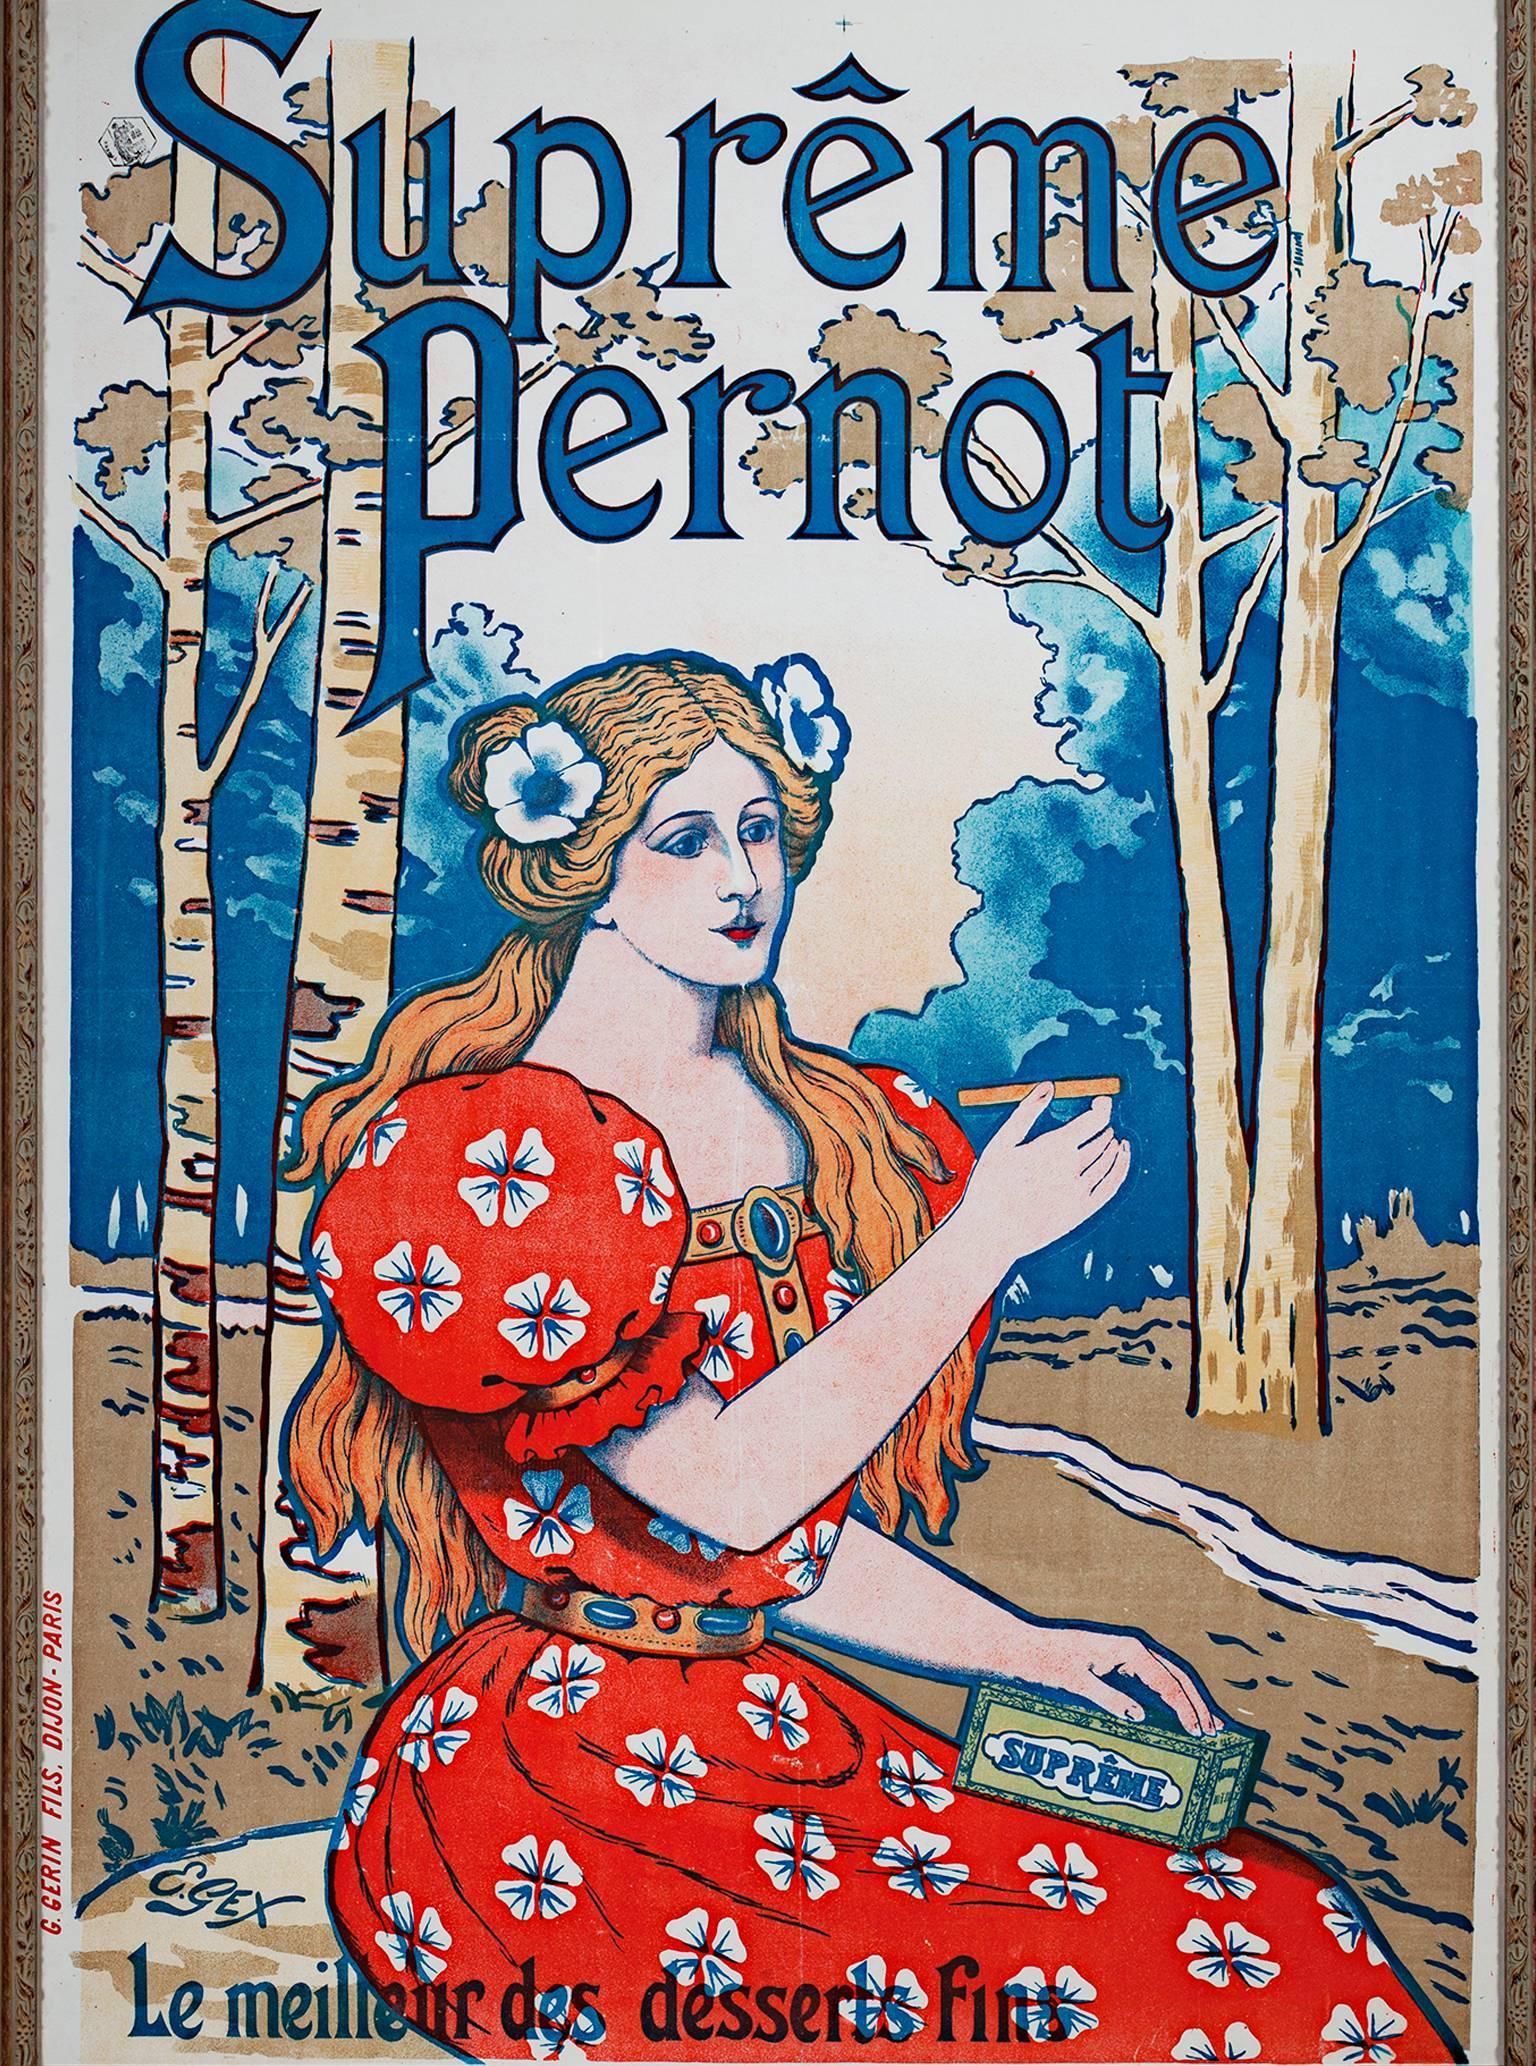 """Supreme Pernot,"" Original Color Lithograph Poster by E. Gex"